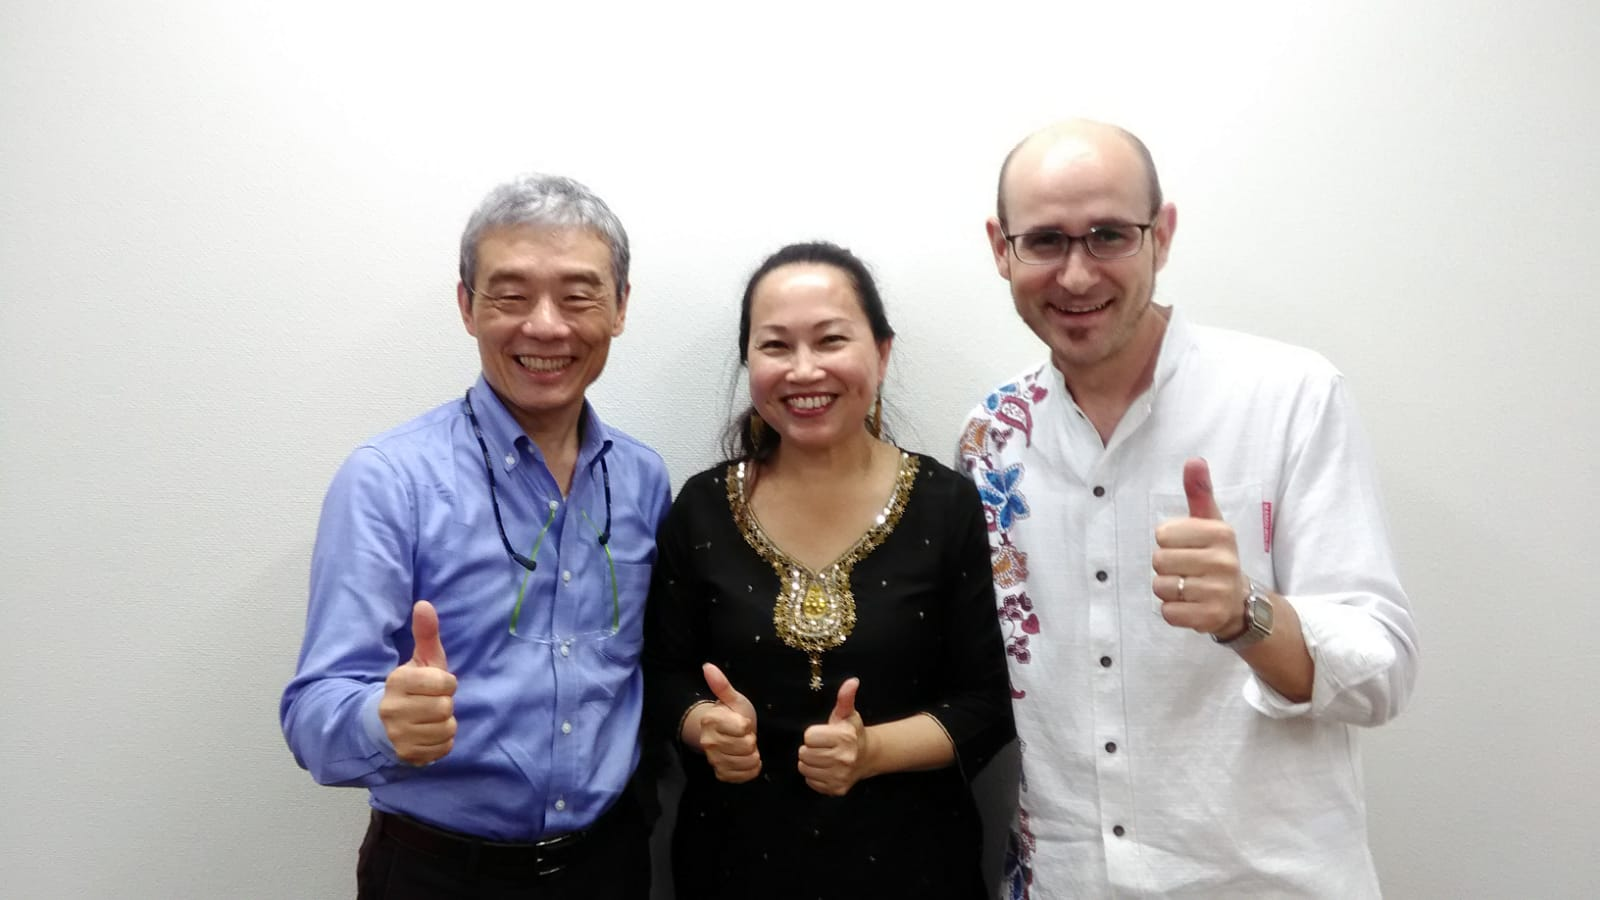 FNS Certified SPOTLight Trainers 'Hideyuki Yoshioka' and 'Stefan Nüsperling' for Japan on 23 June 2018